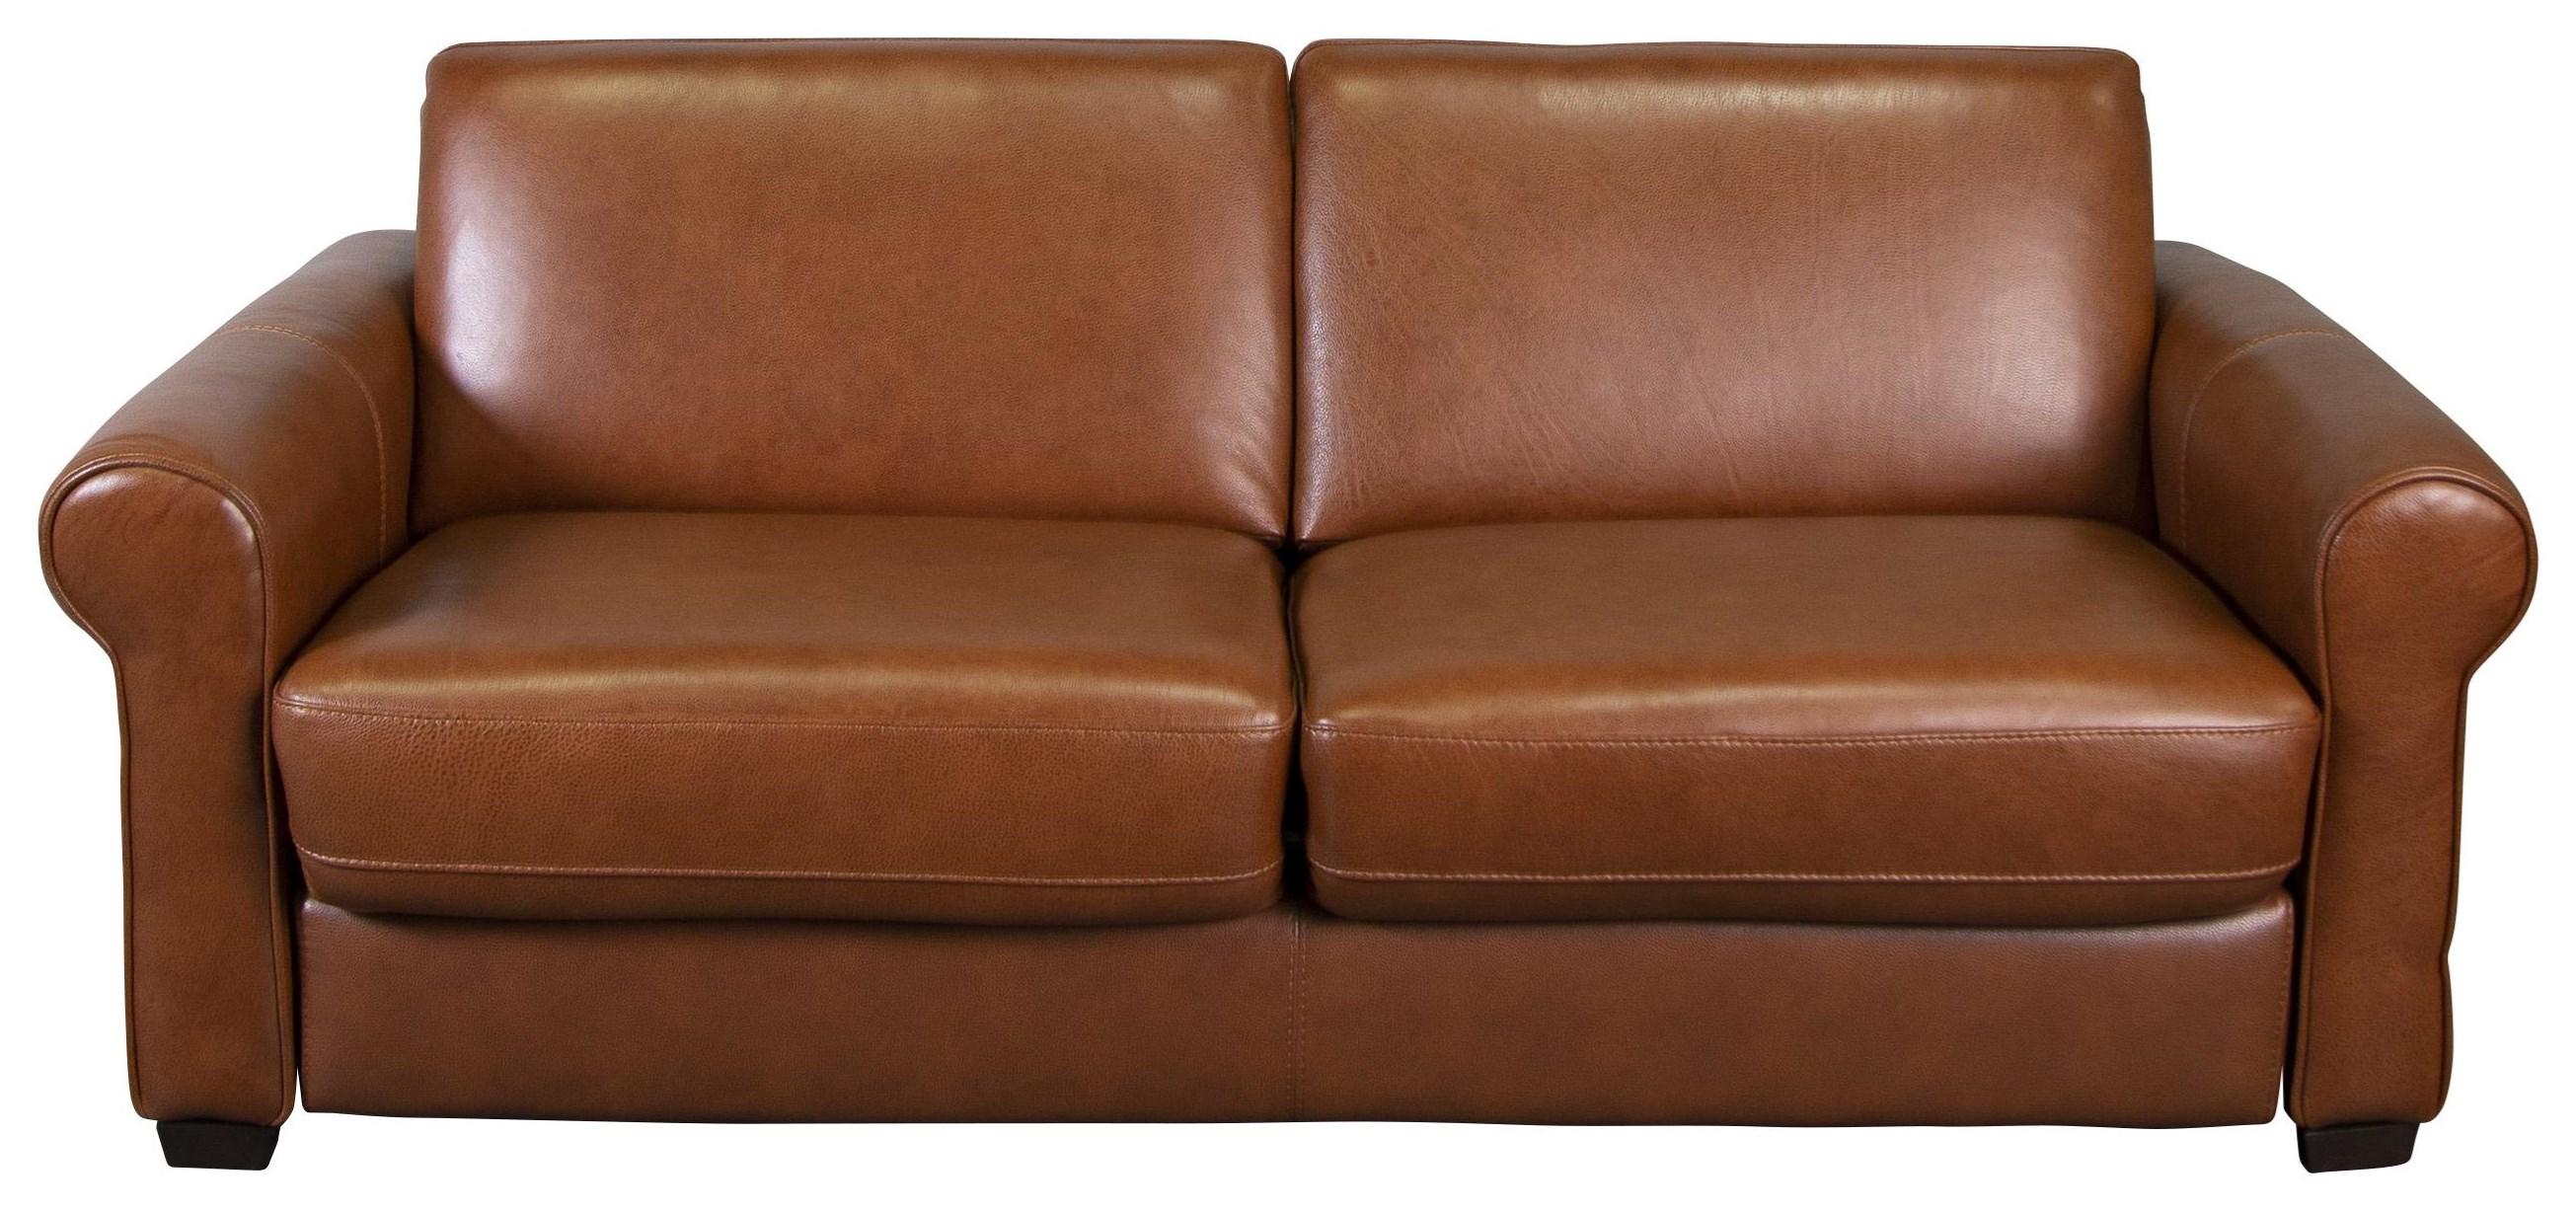 Arley 100%  Leather Sofa Sleeper